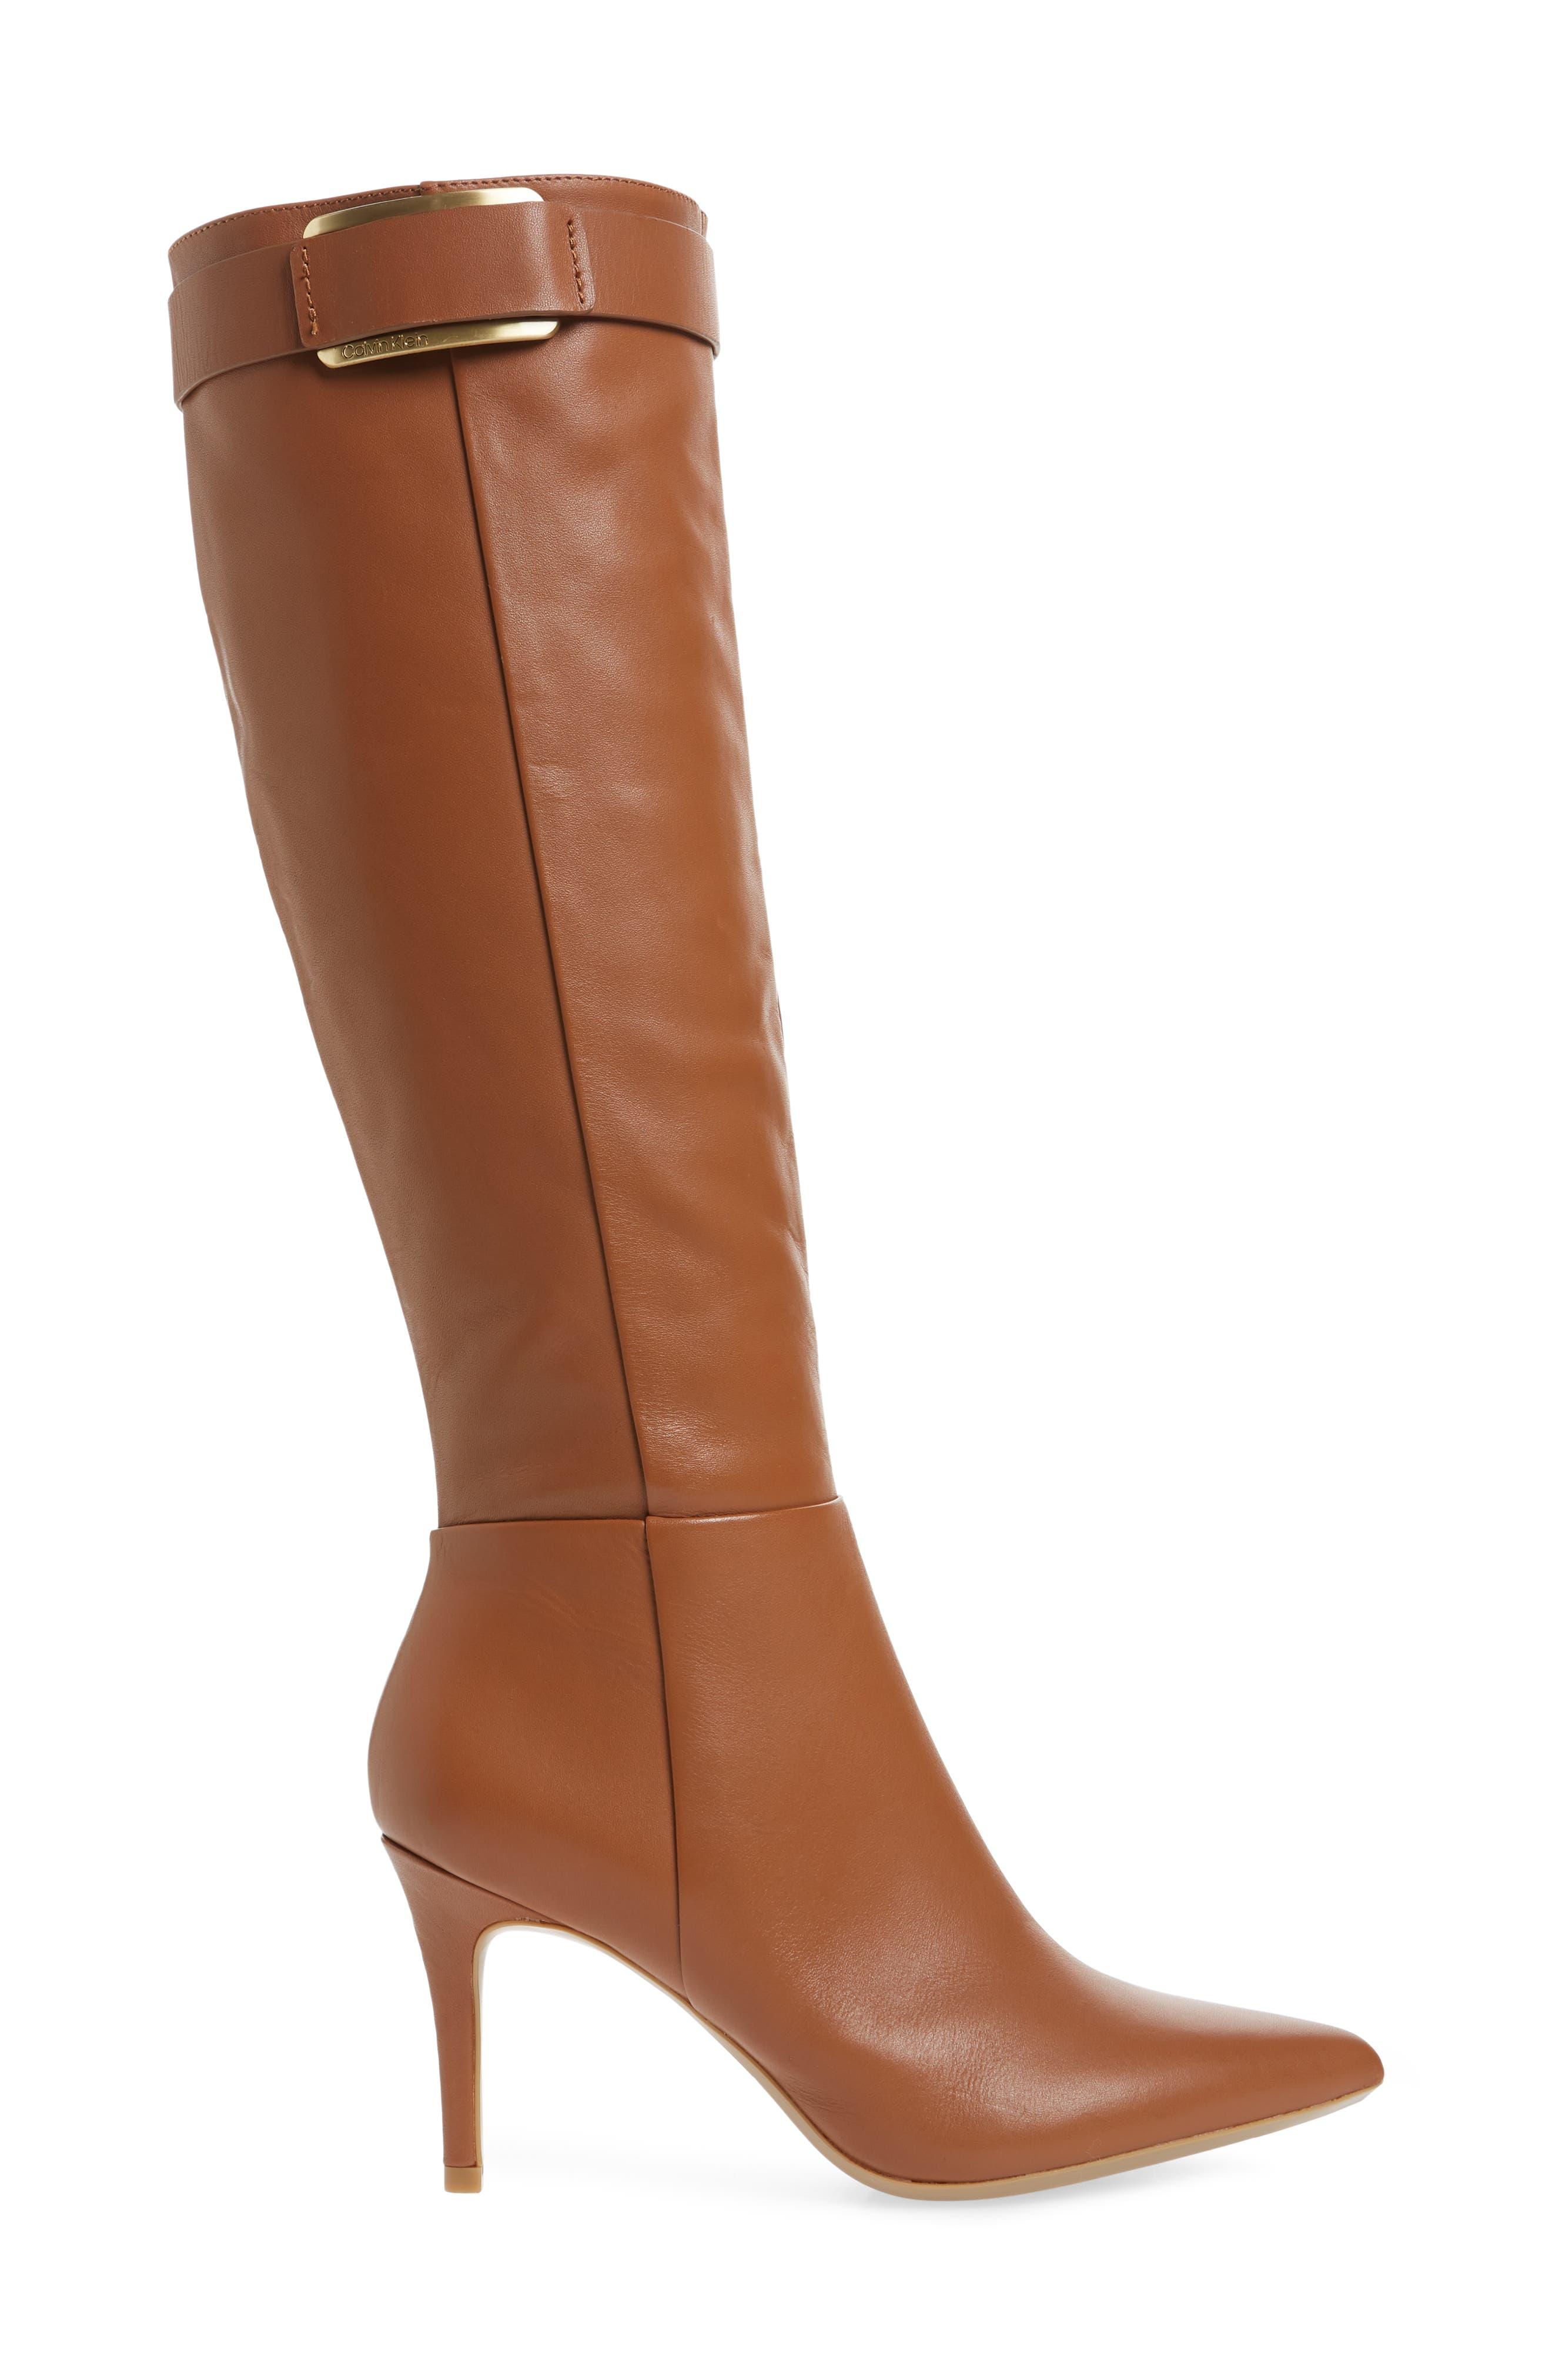 Glydia Stiletto Knee High Boot,                             Alternate thumbnail 3, color,                             COGNAC LEATHER